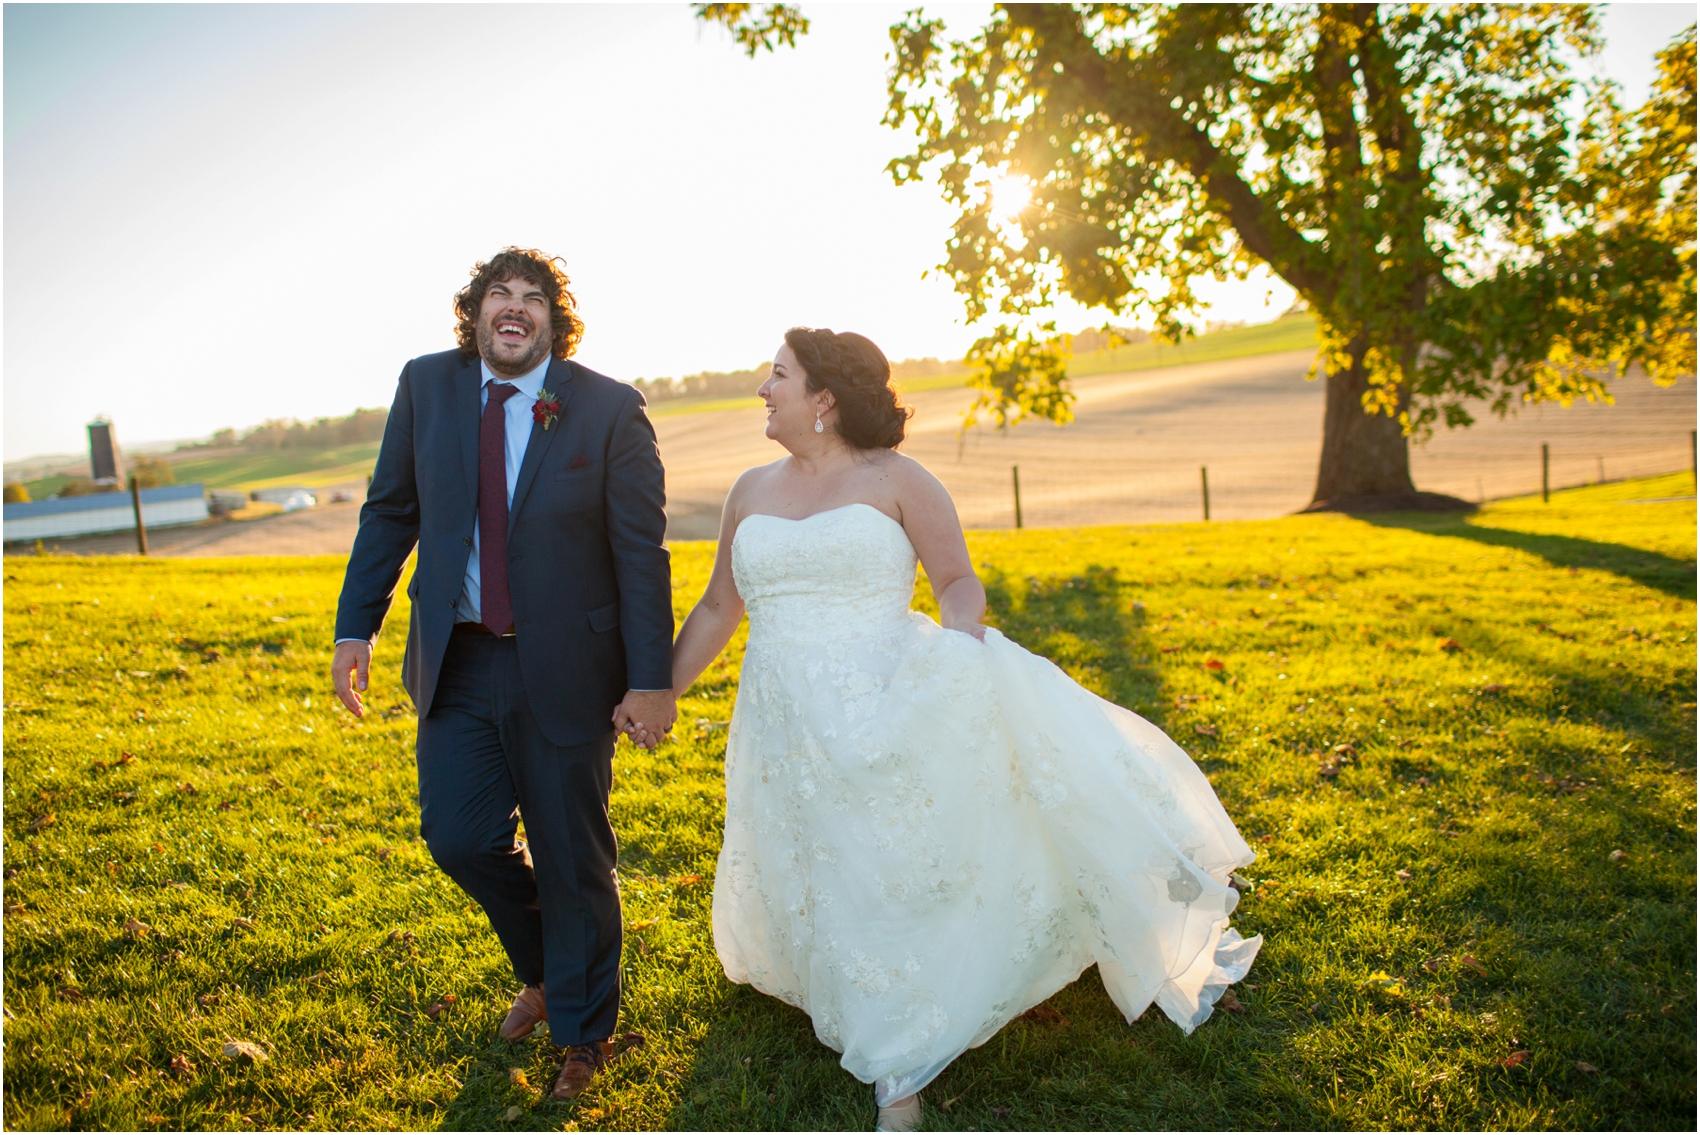 On-Sunny-Slope-Farm-Fall-Virginia-Wedding-3375.jpg